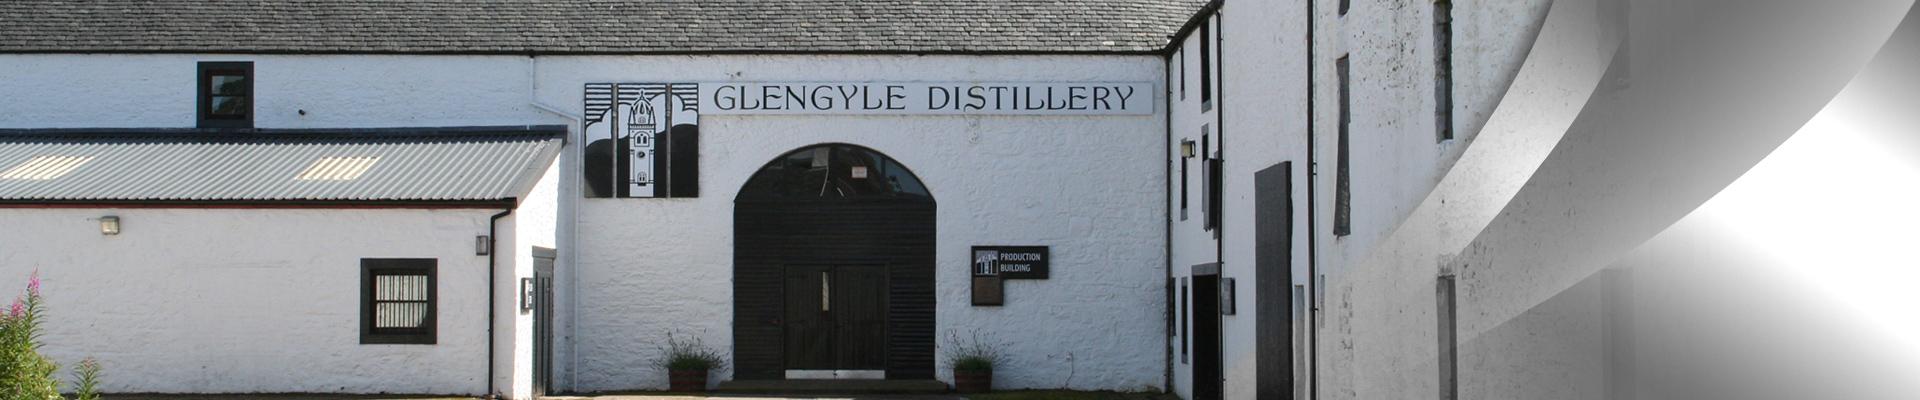 Glengyle